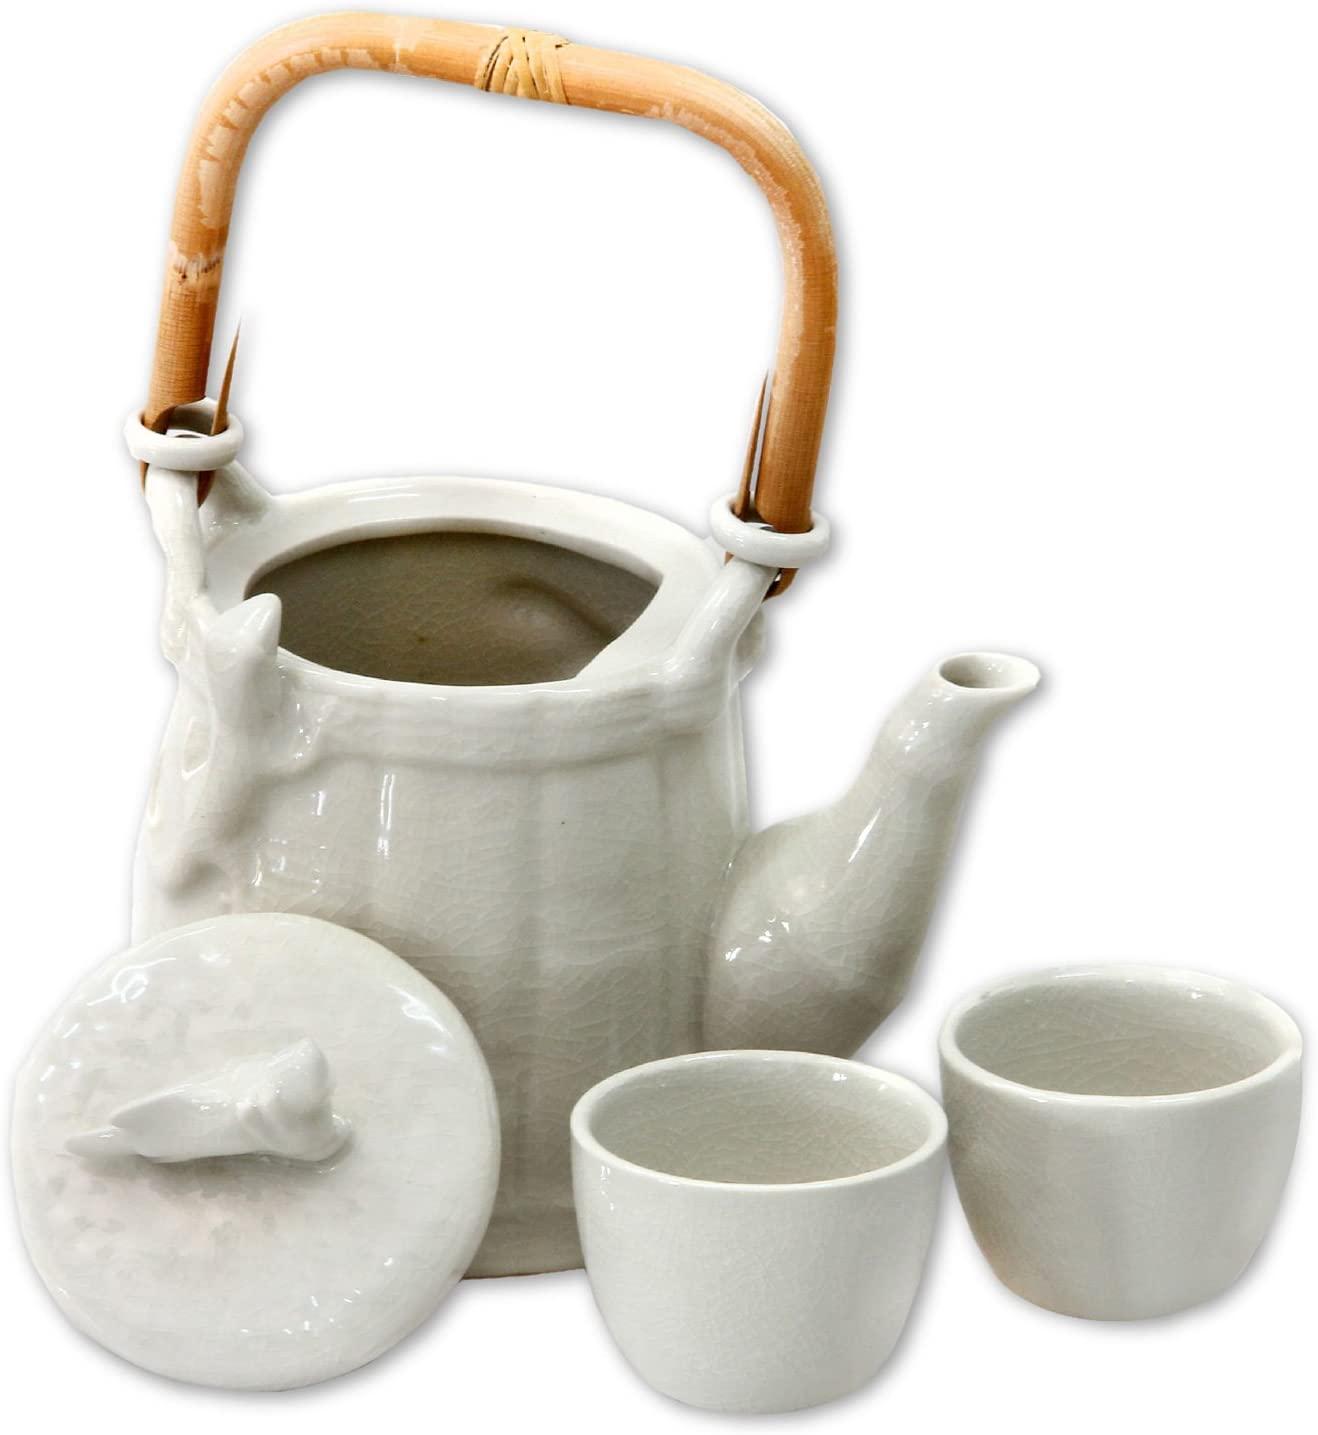 NOVICA Animal Themed Ceramic Tea Set, White, 2 Oz, Cricket And Gecko' (Set For 2)